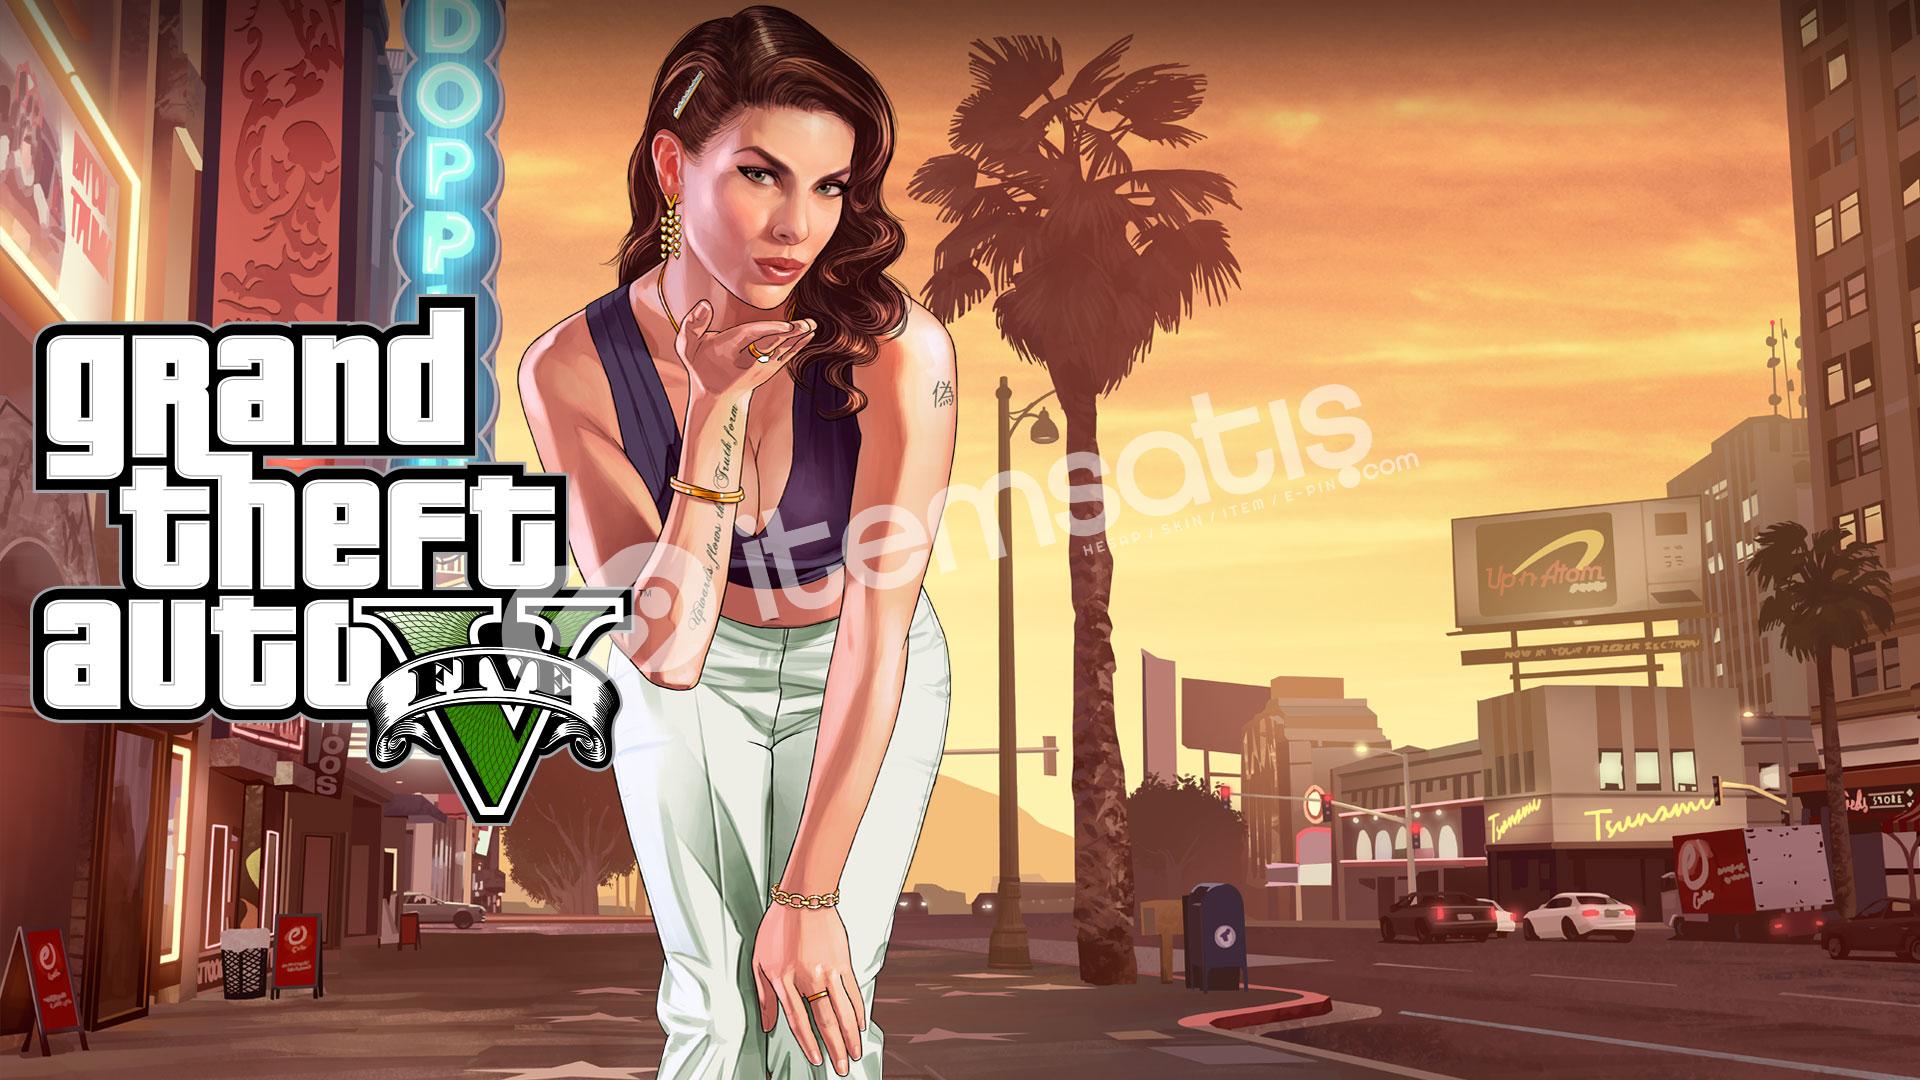 Grand Theft Auto V Social Club hesab online level 100-200 vb